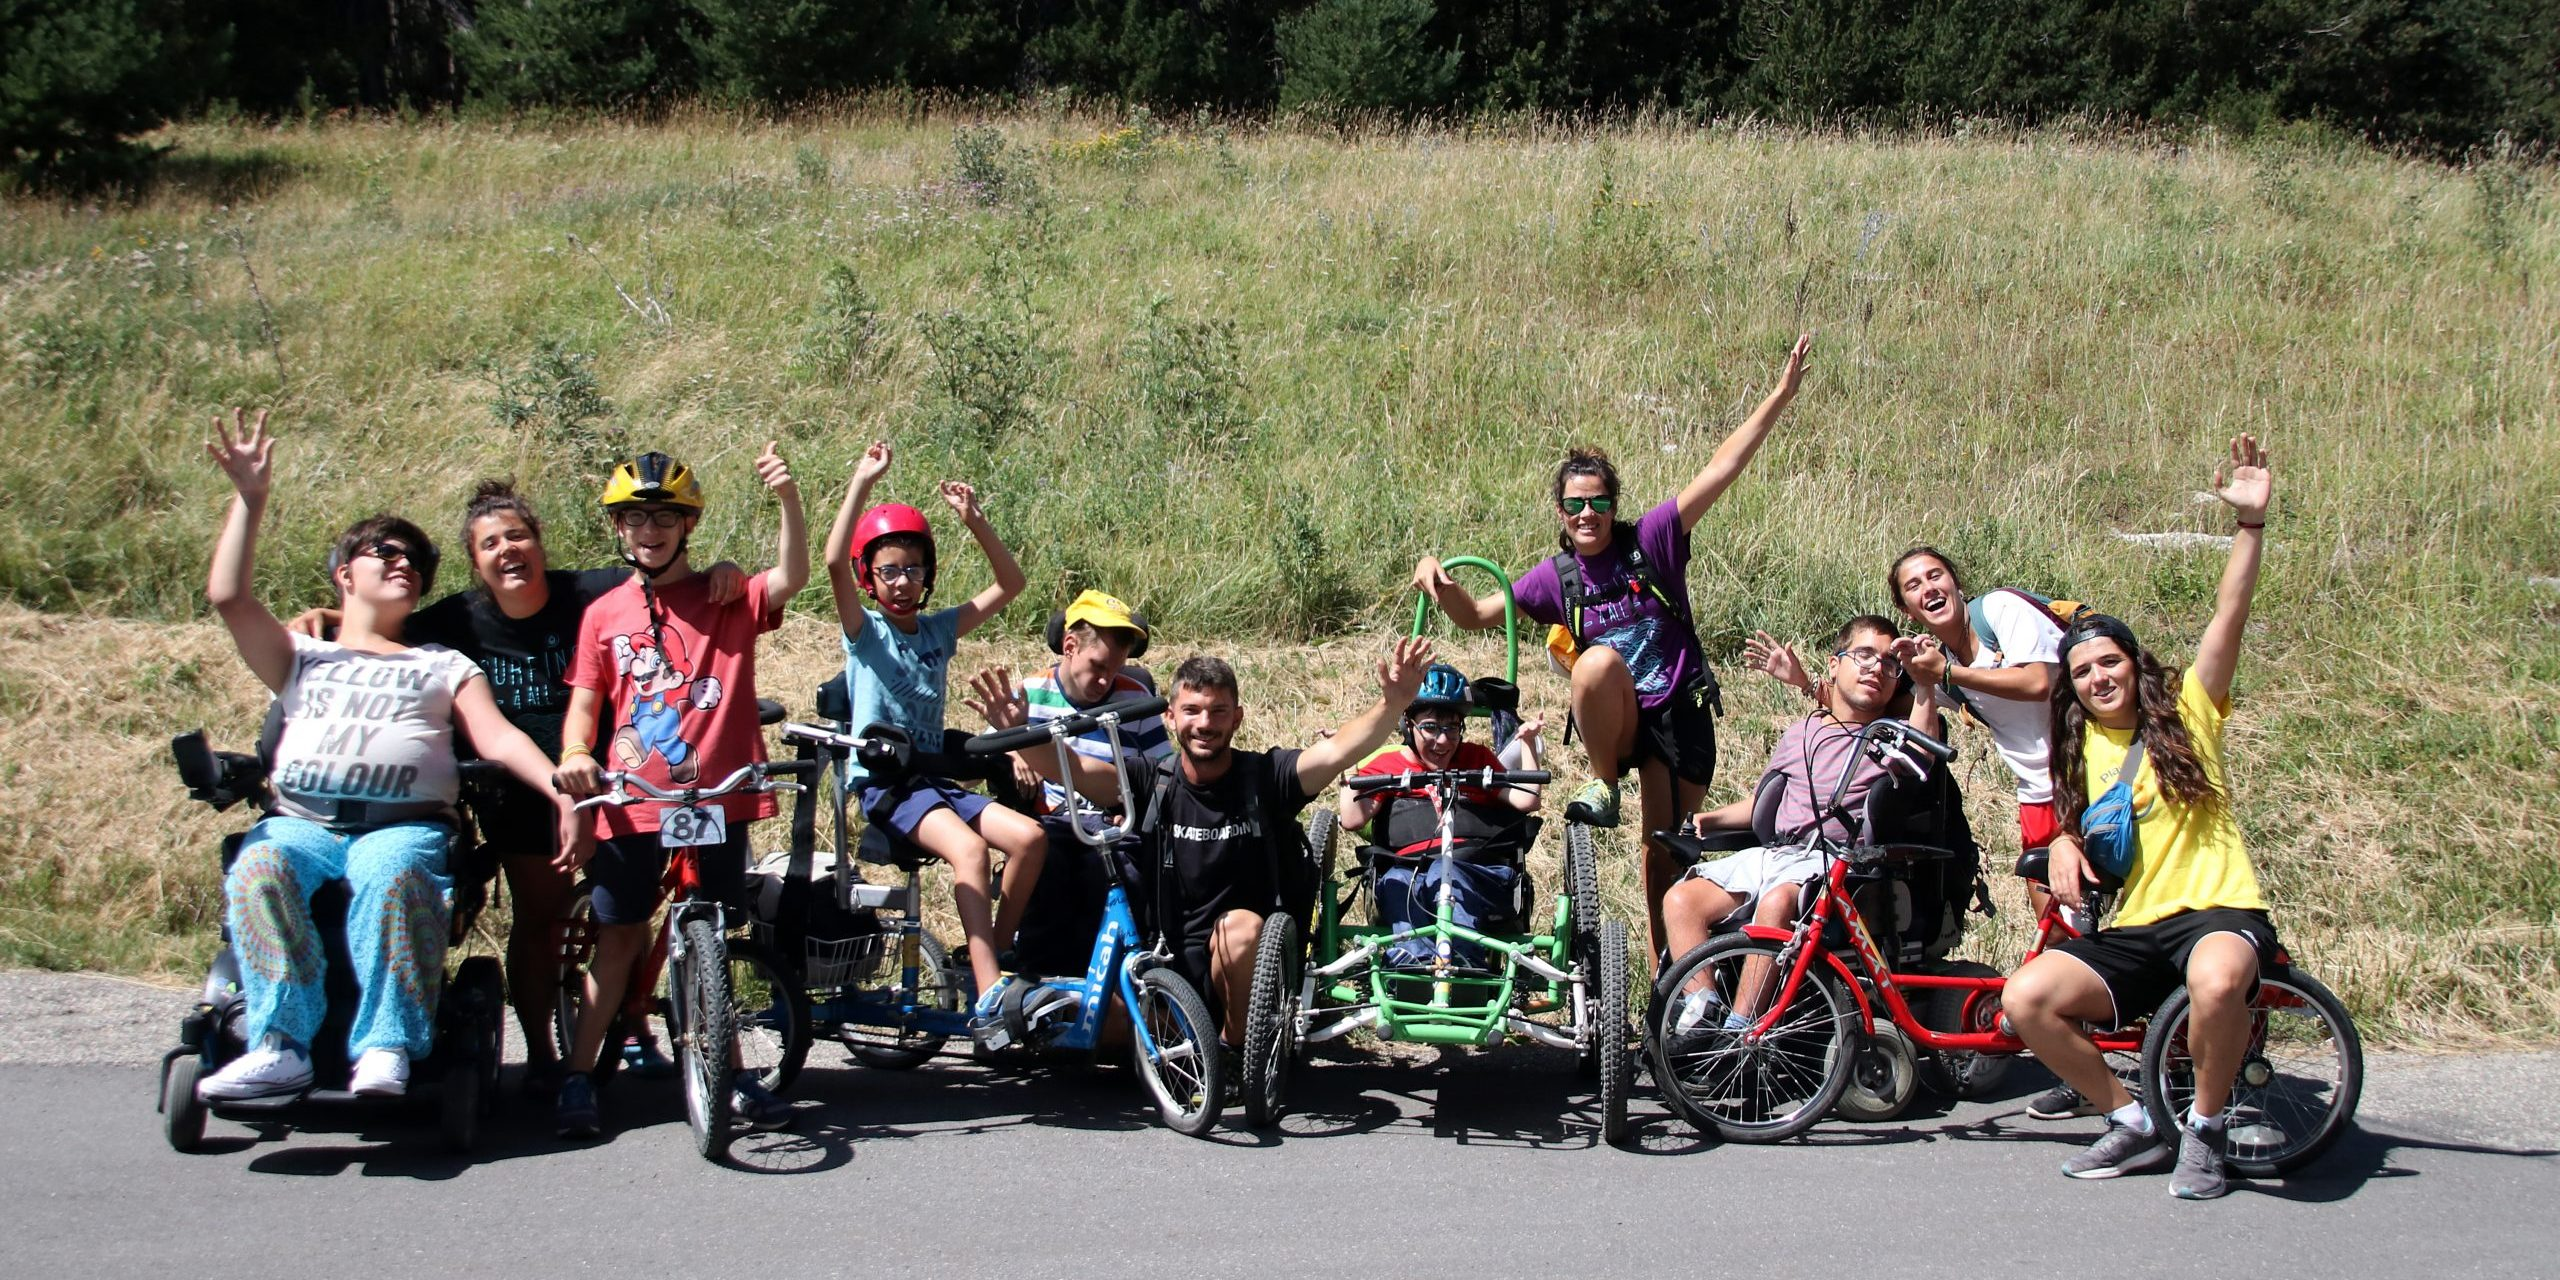 Foto de grupo salida en bicicletas adaptadas